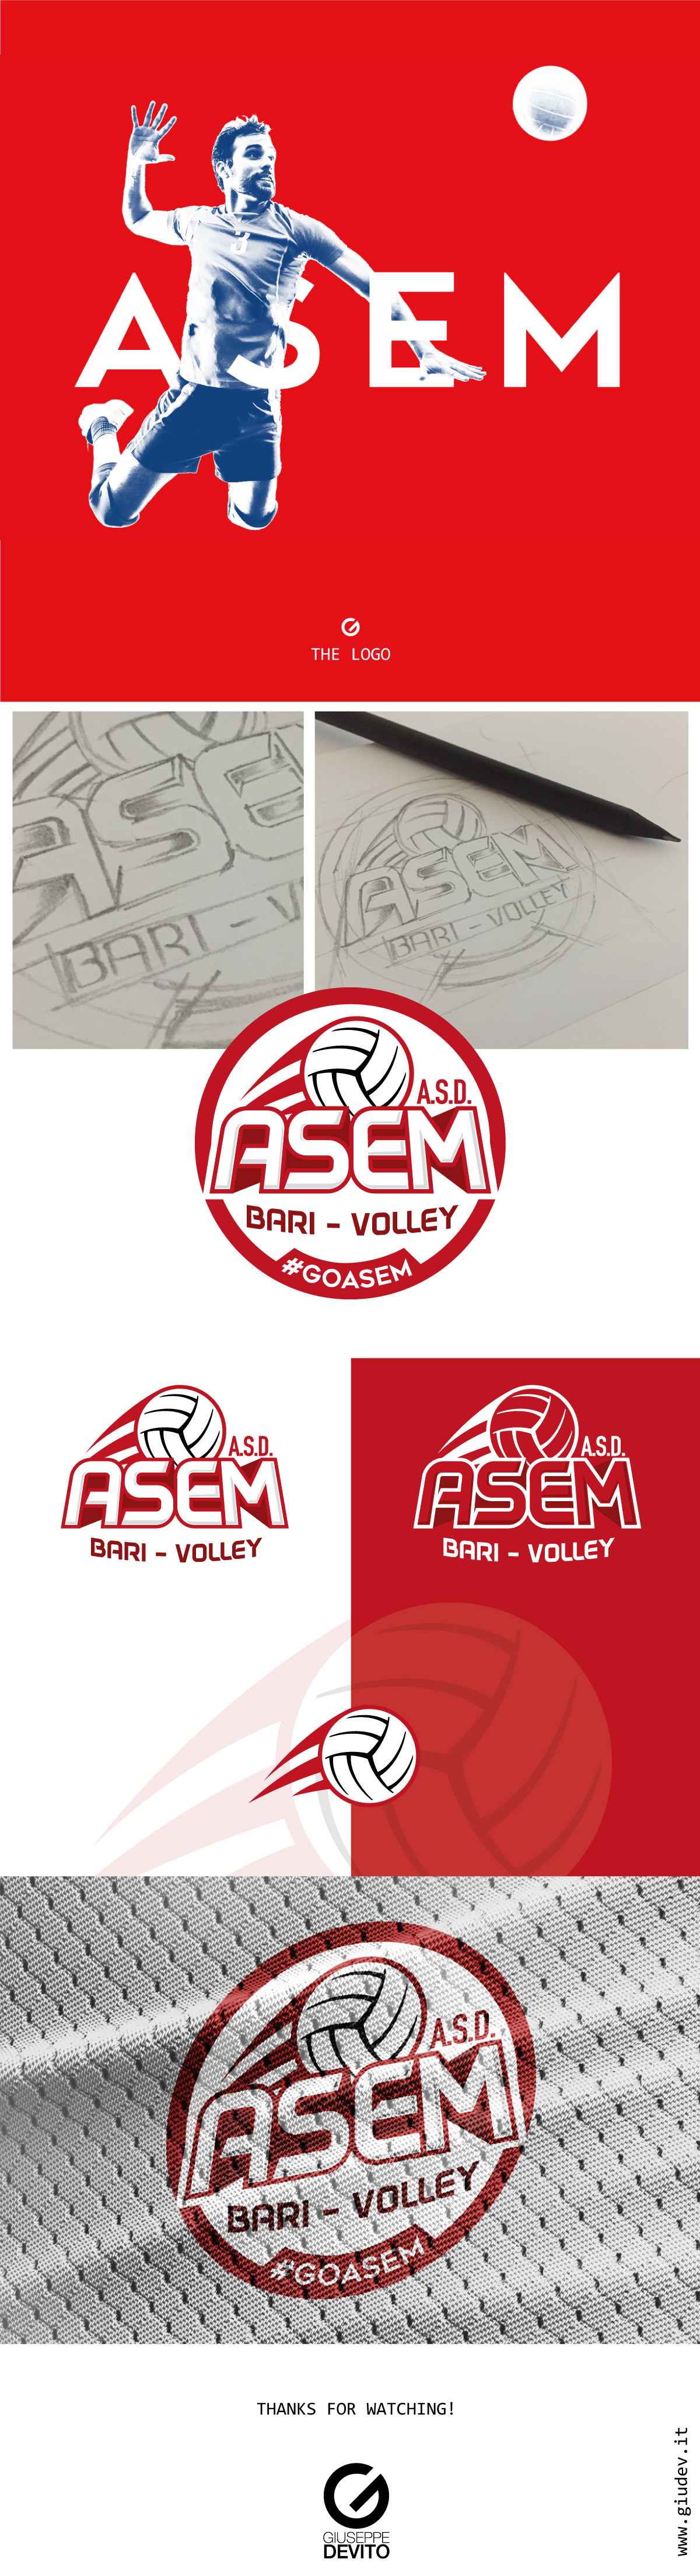 asem-bari-volley-logo-design